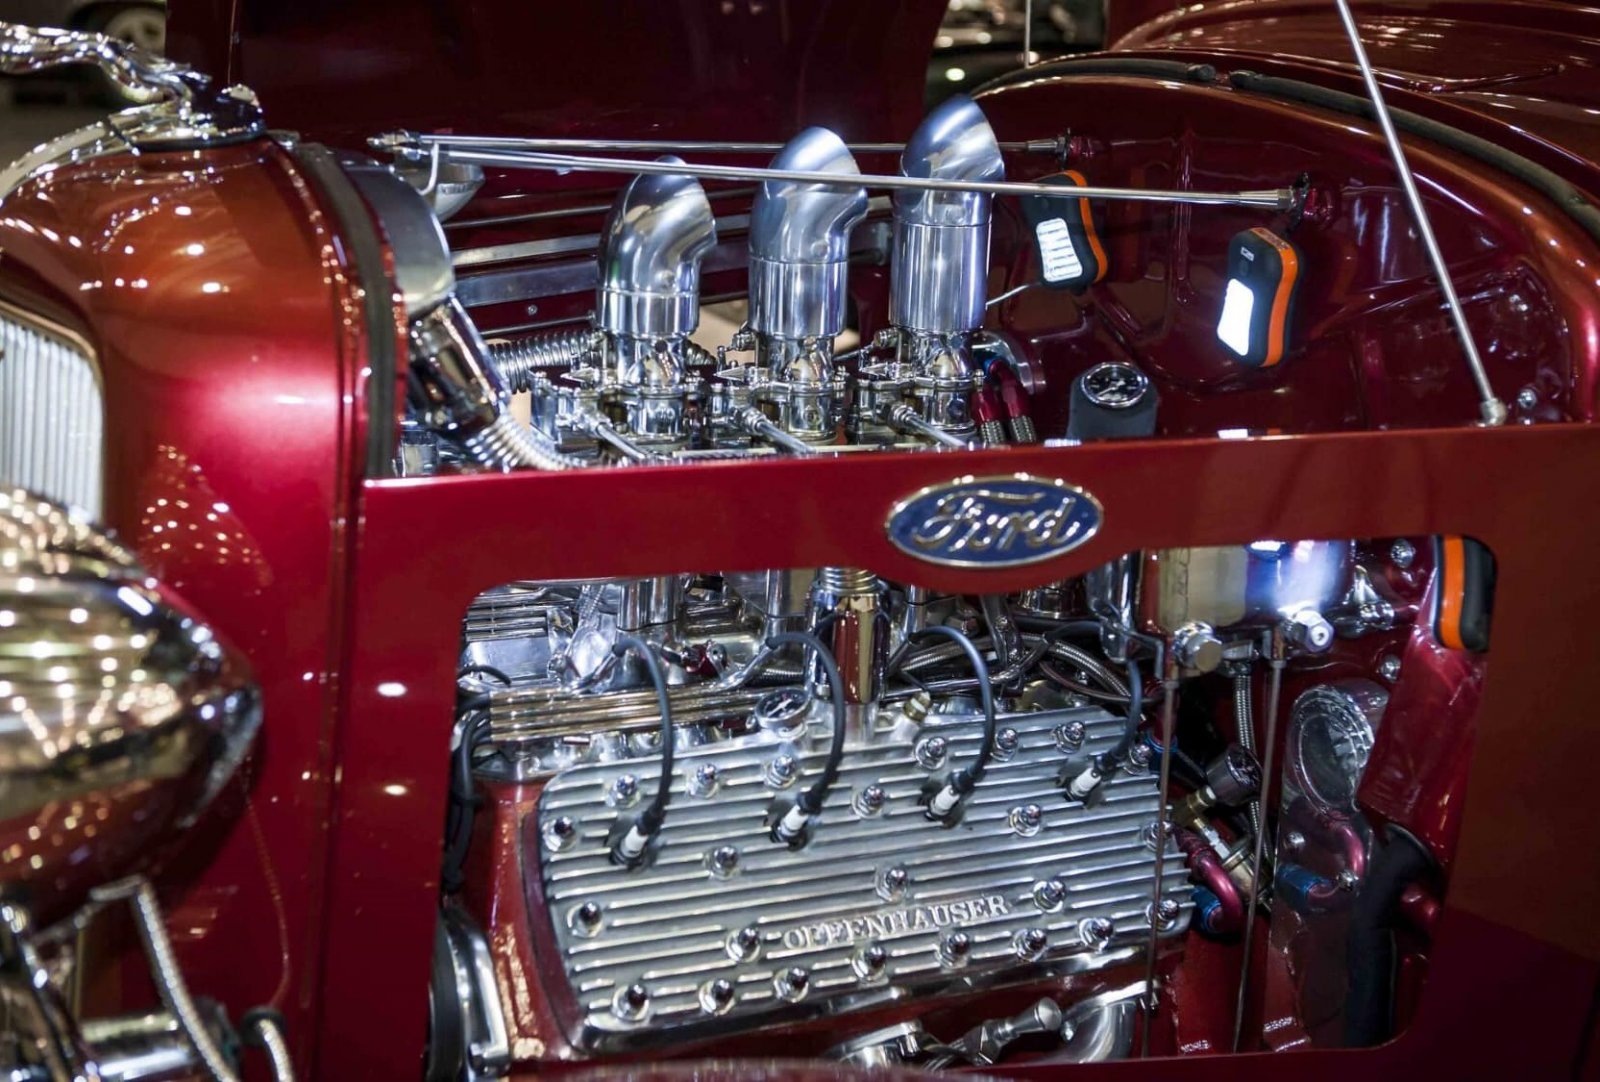 1934 Flathead Engine With Full Race Cam 3 Carbs 4.jpg